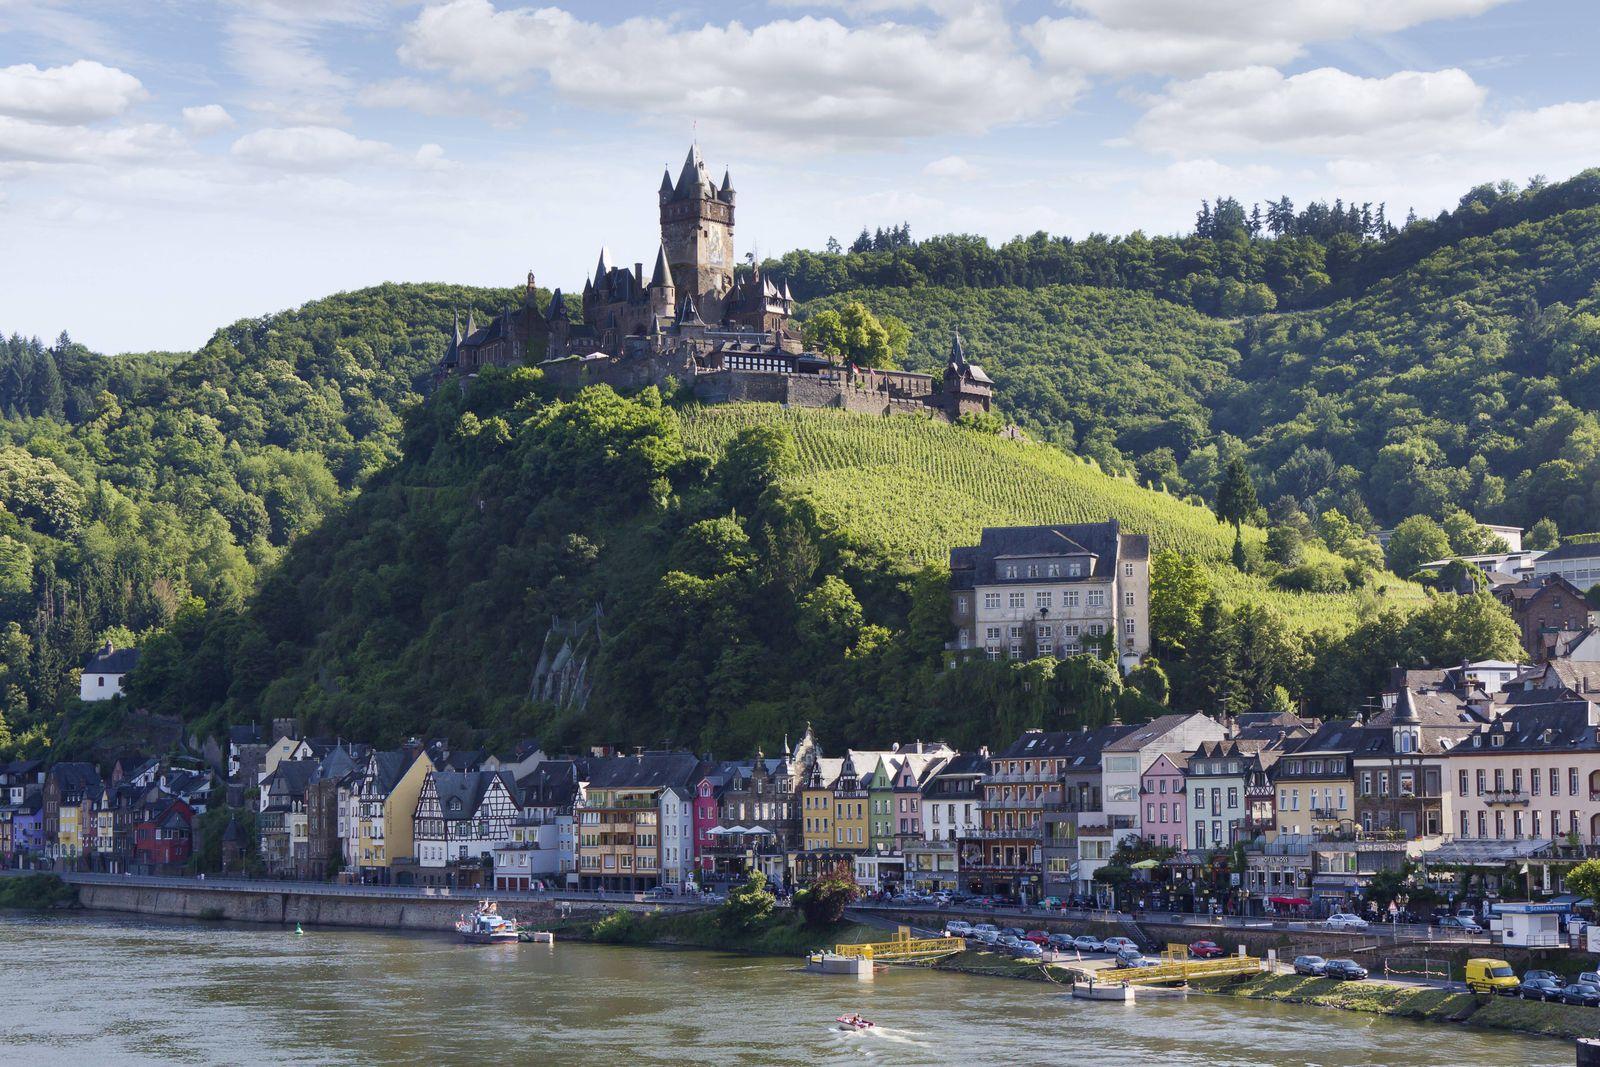 Germany Rhineland Palatinate Cochem imperial Castle in Mosel valley PUBLICATIONxINxGERxSUIxAUTxHU